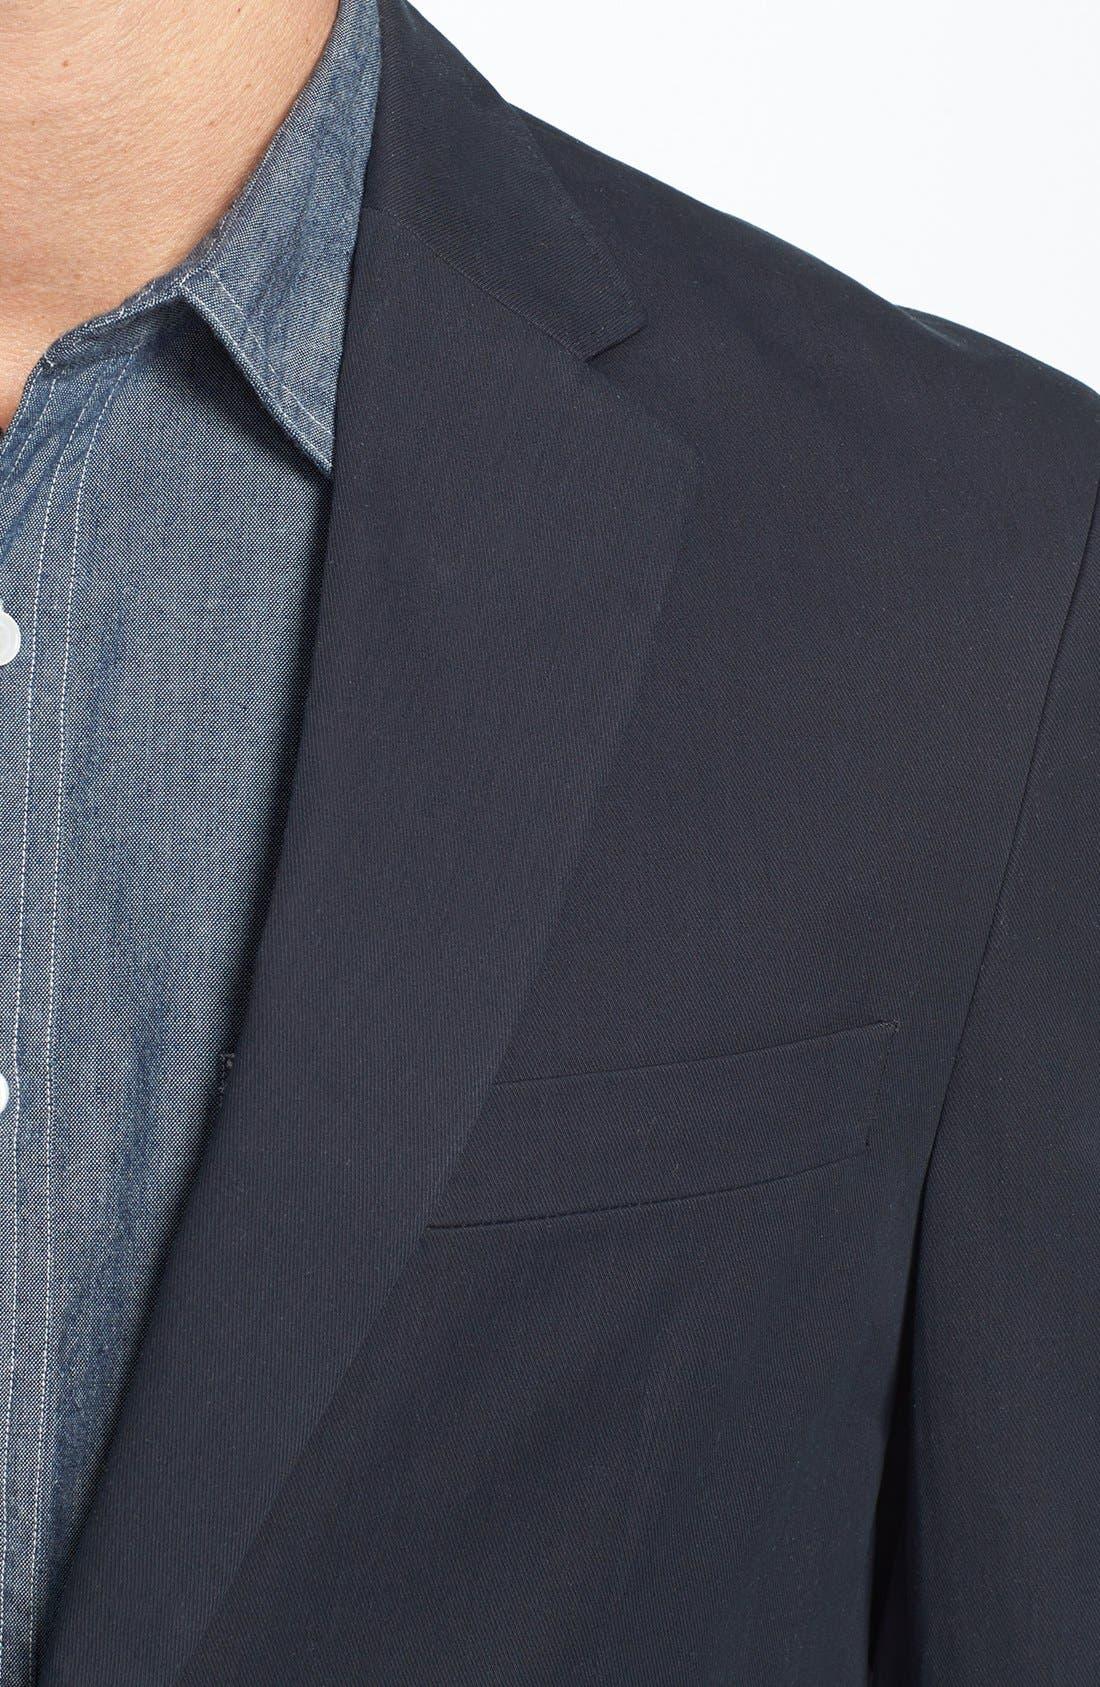 Alternate Image 3  - Robert Graham 'Julian' Cotton Sportcoat